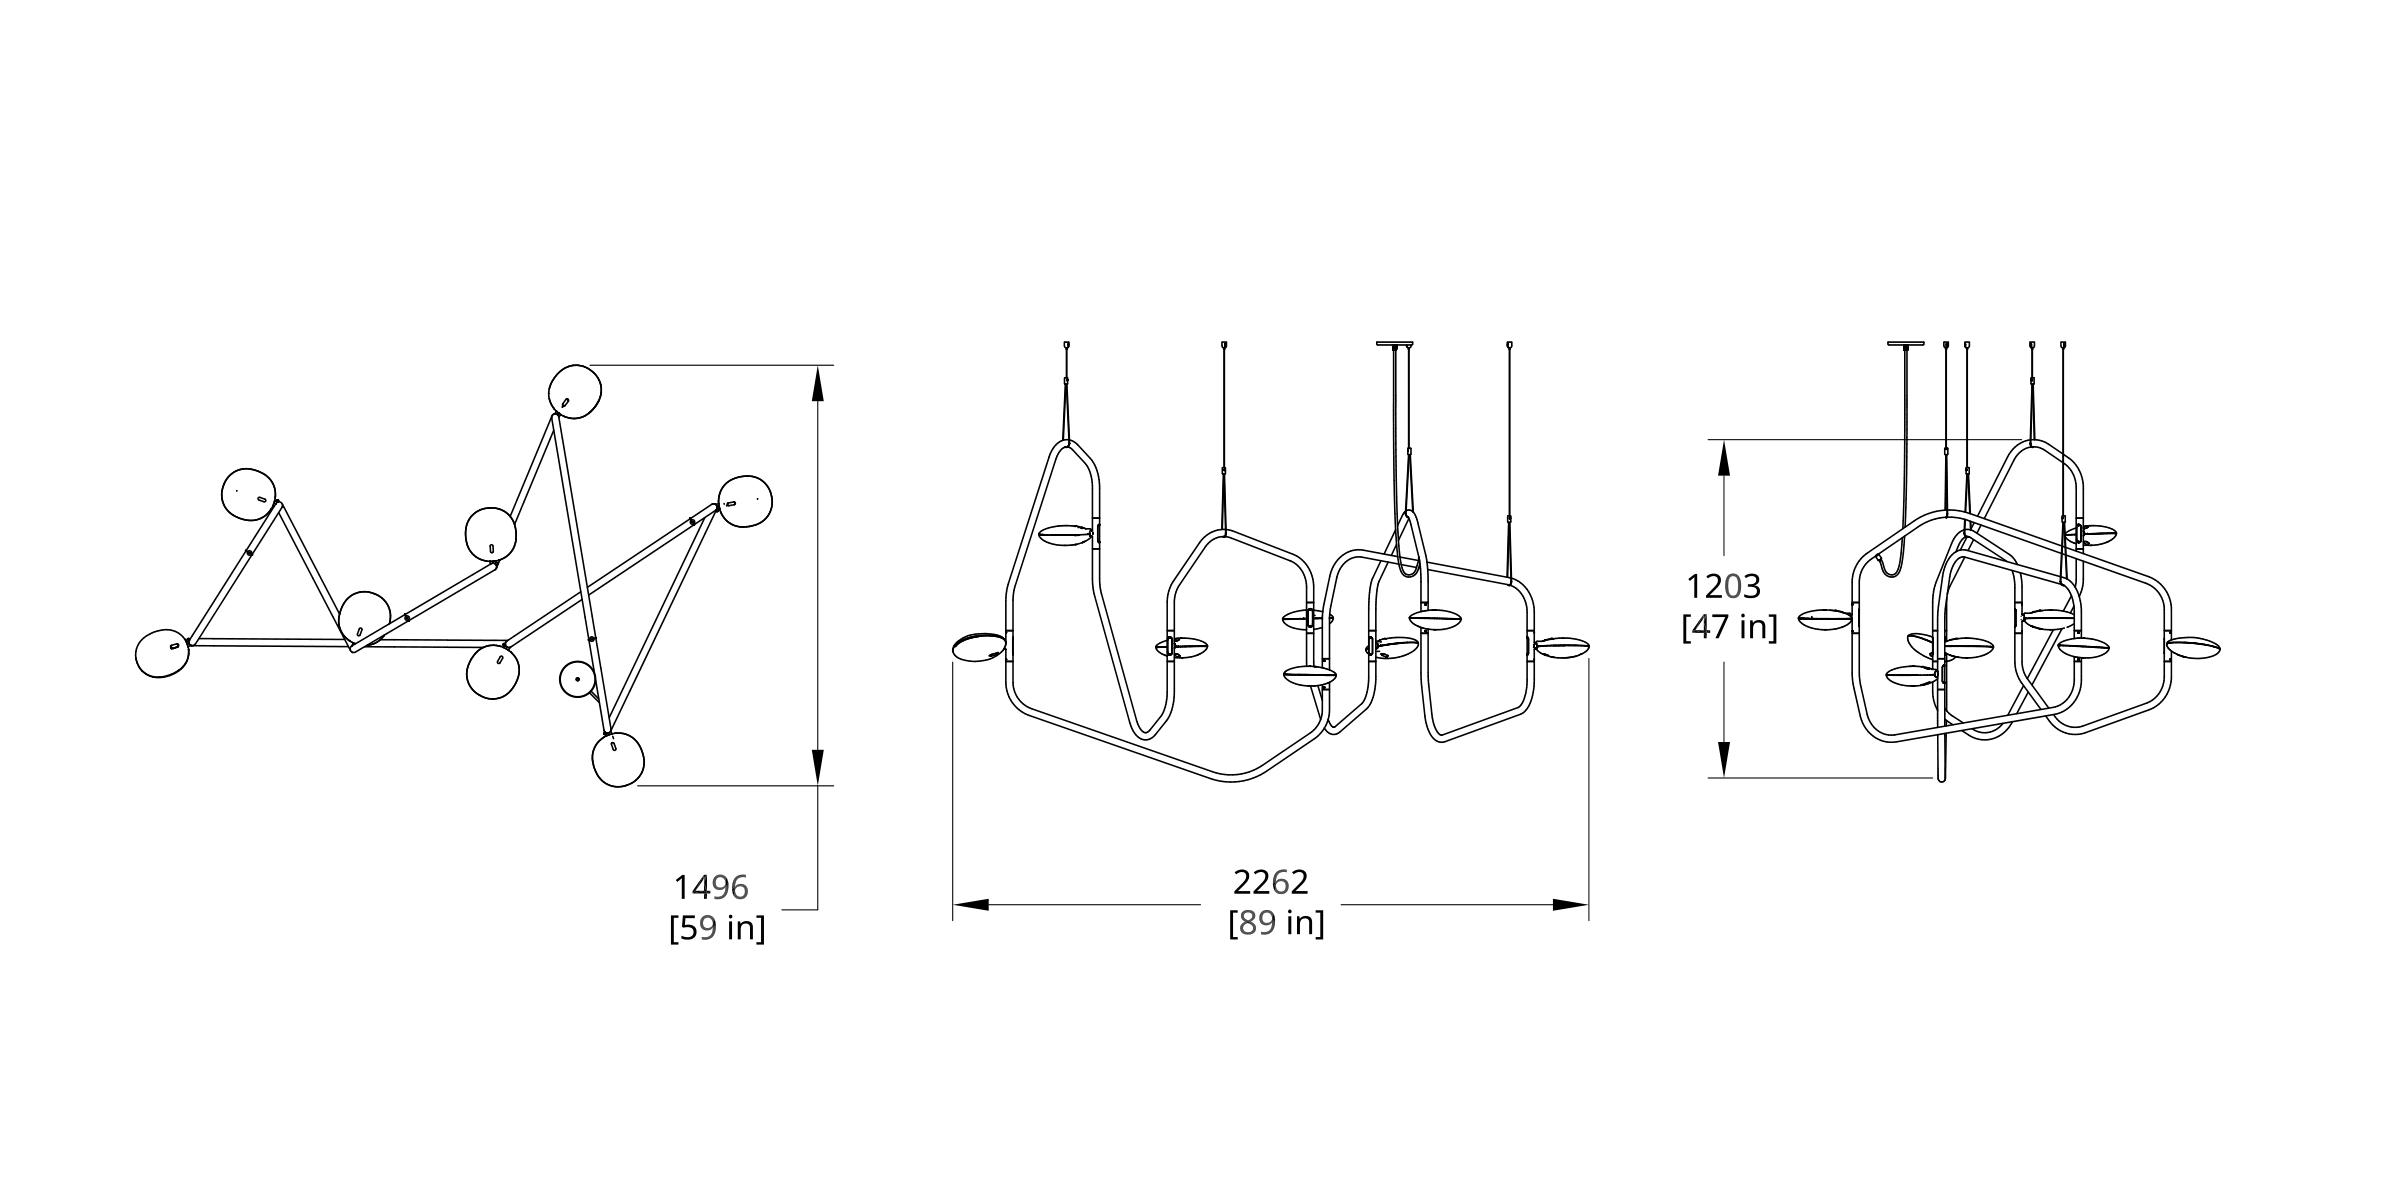 PD-8 Palindrome Chandelier (Dynamic) Dimension